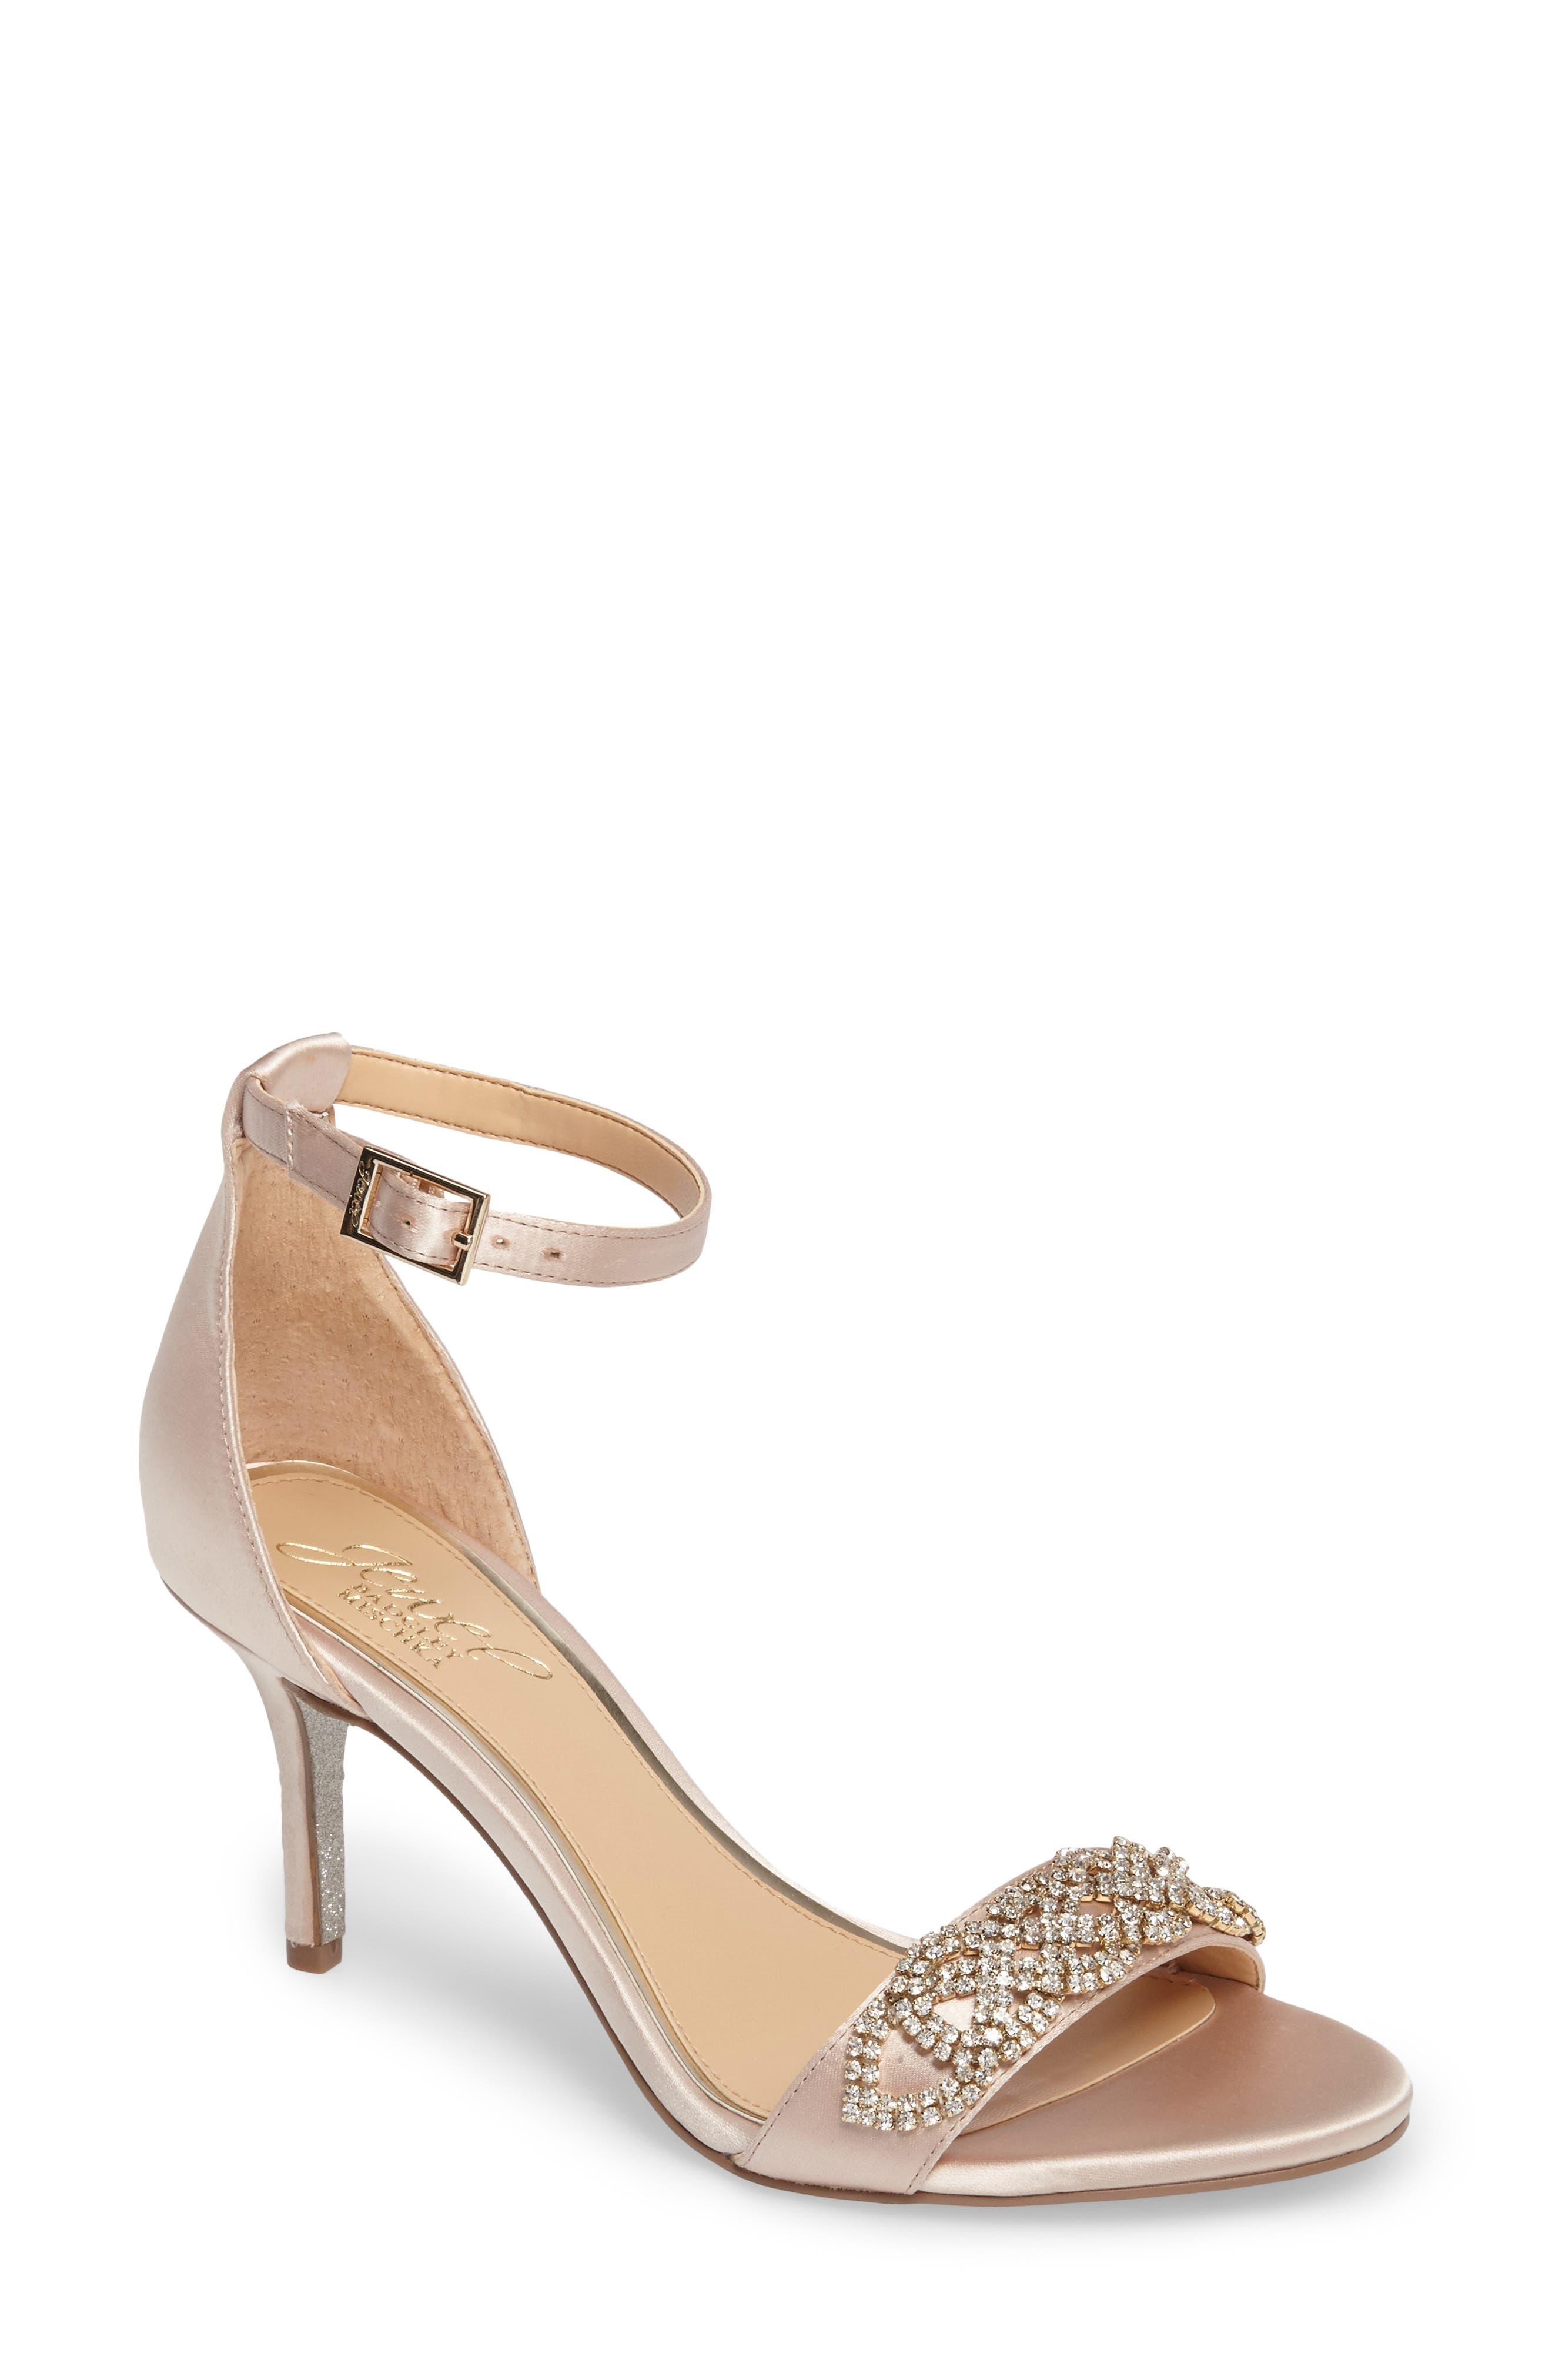 Alana Ankle Strap Sandal,                             Main thumbnail 1, color,                             Champagne Satin